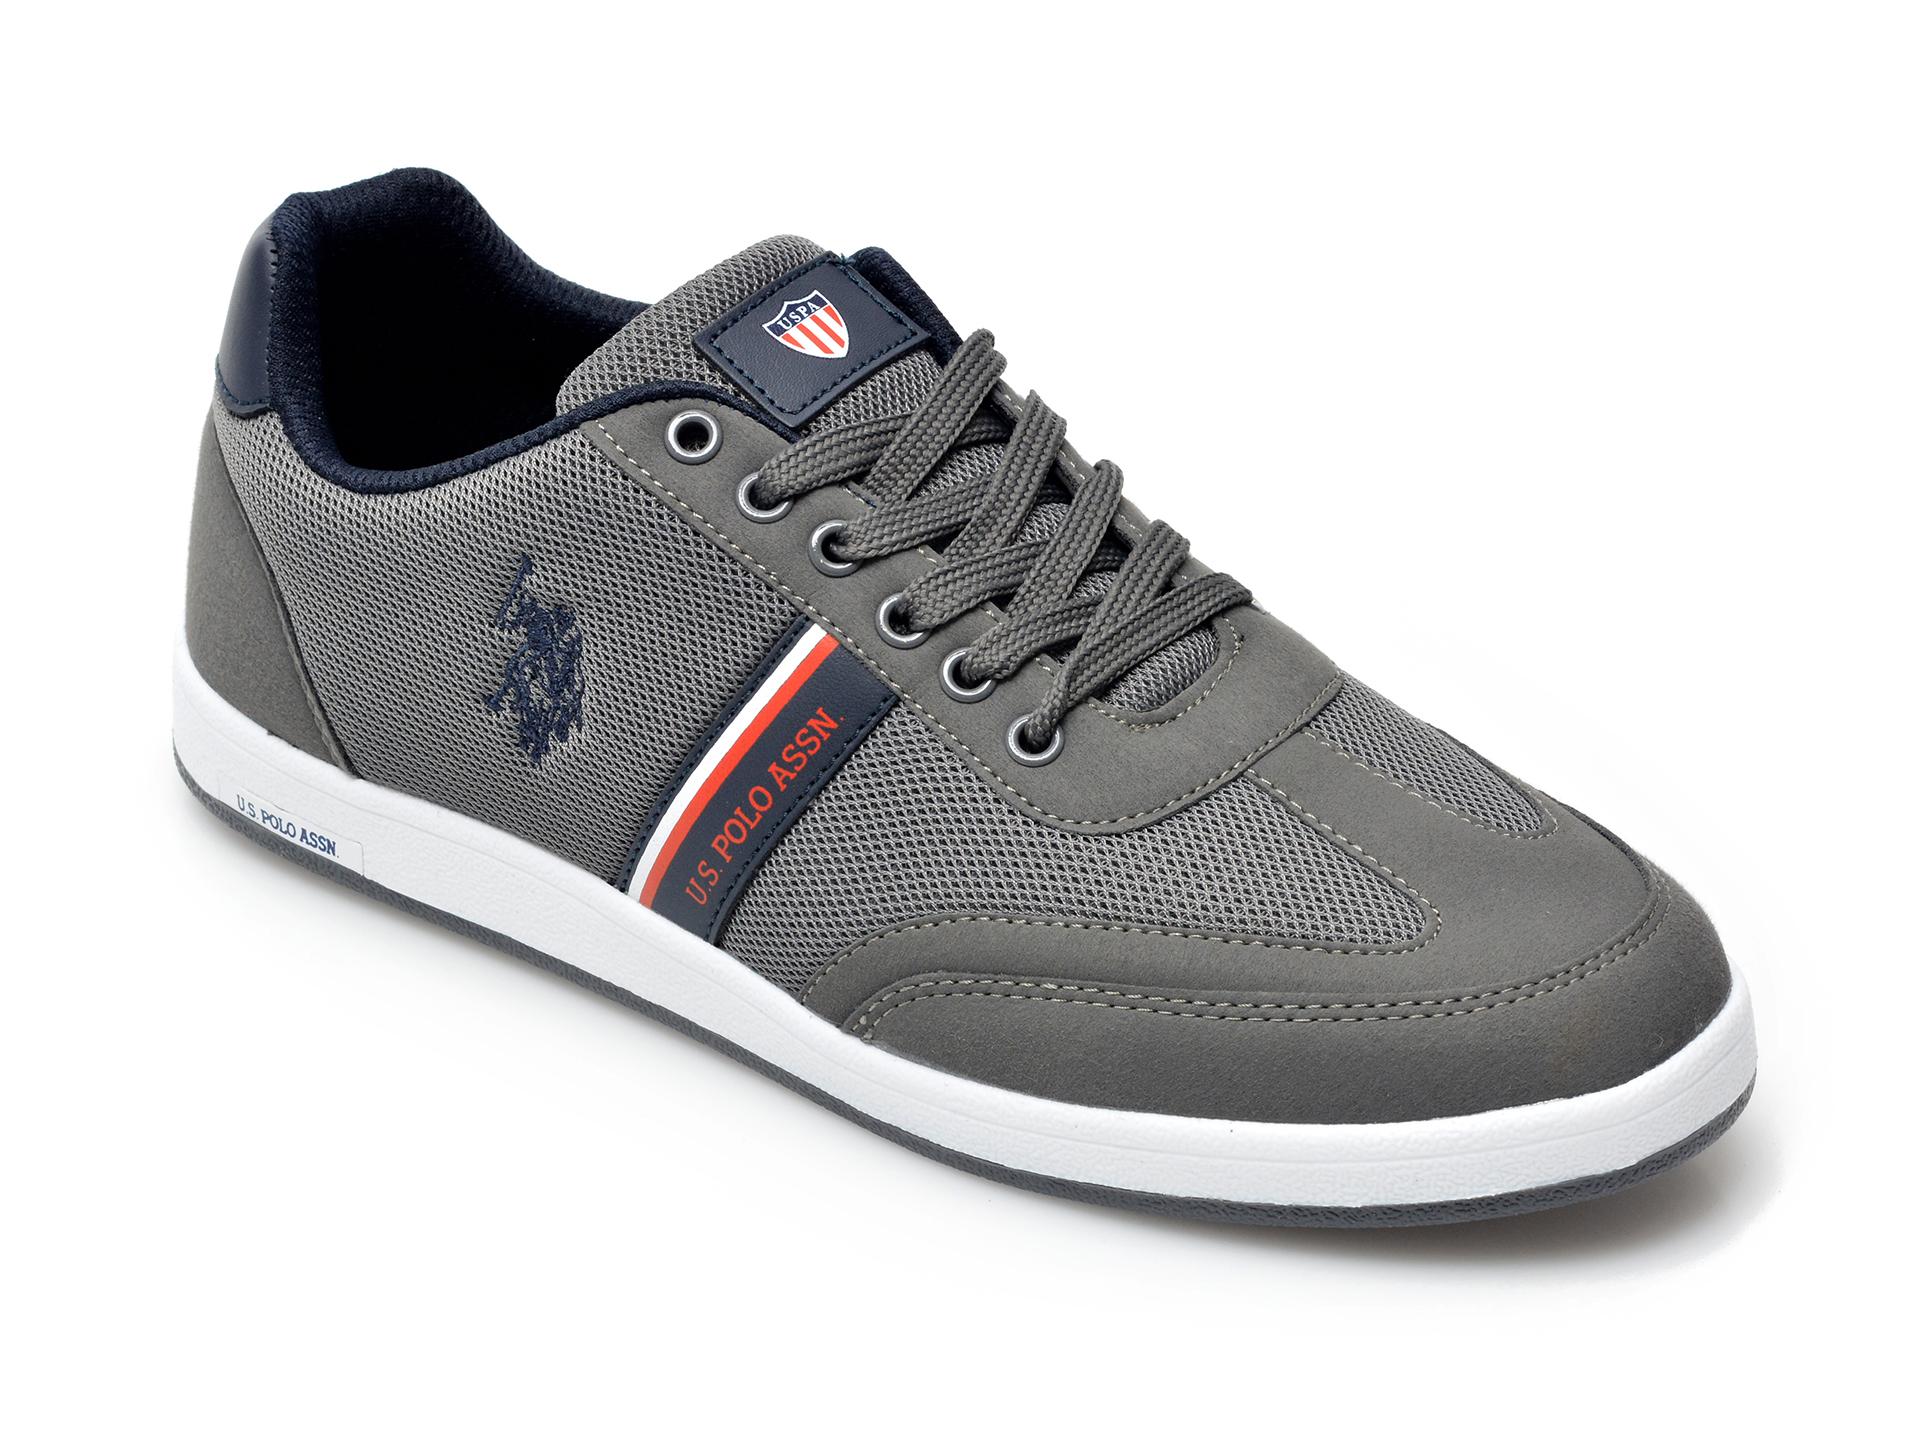 Pantofi sport US POLO ASSN gri, KARE1FX, din material textil si piele ecologica